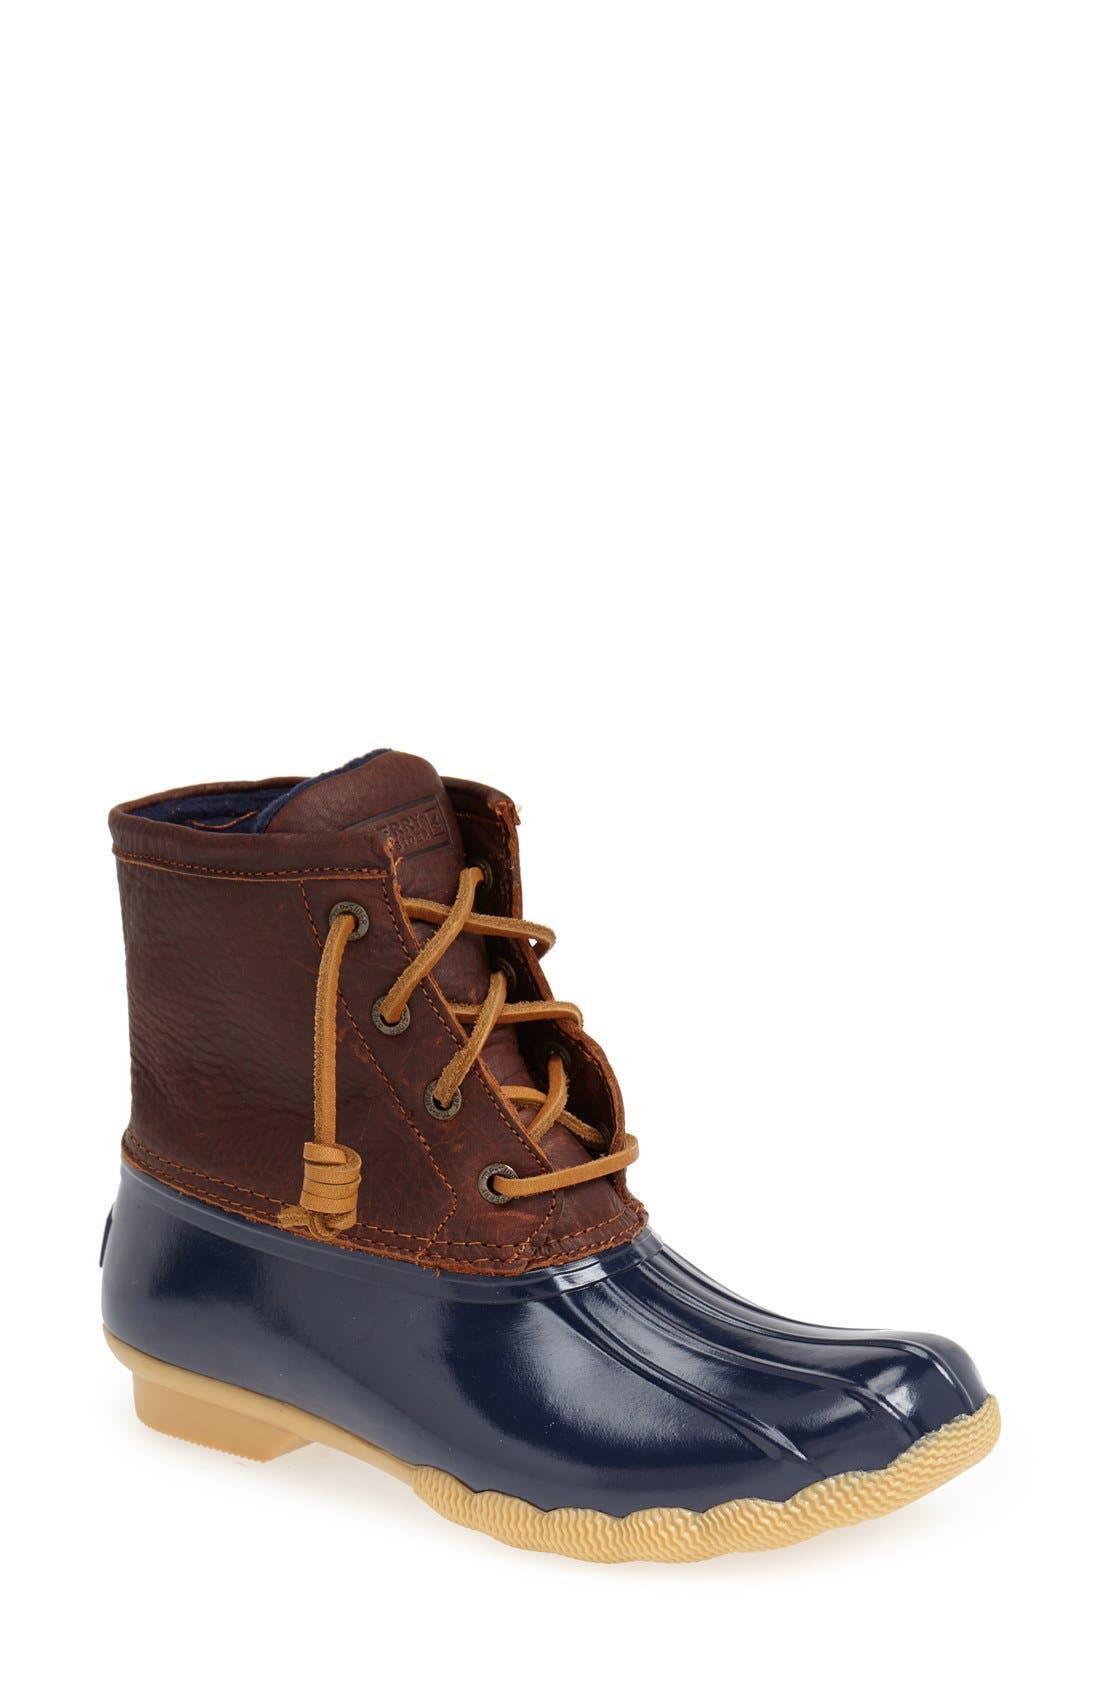 Saltwater Duck Boot,                         Main,                         color, Tan/ Navy